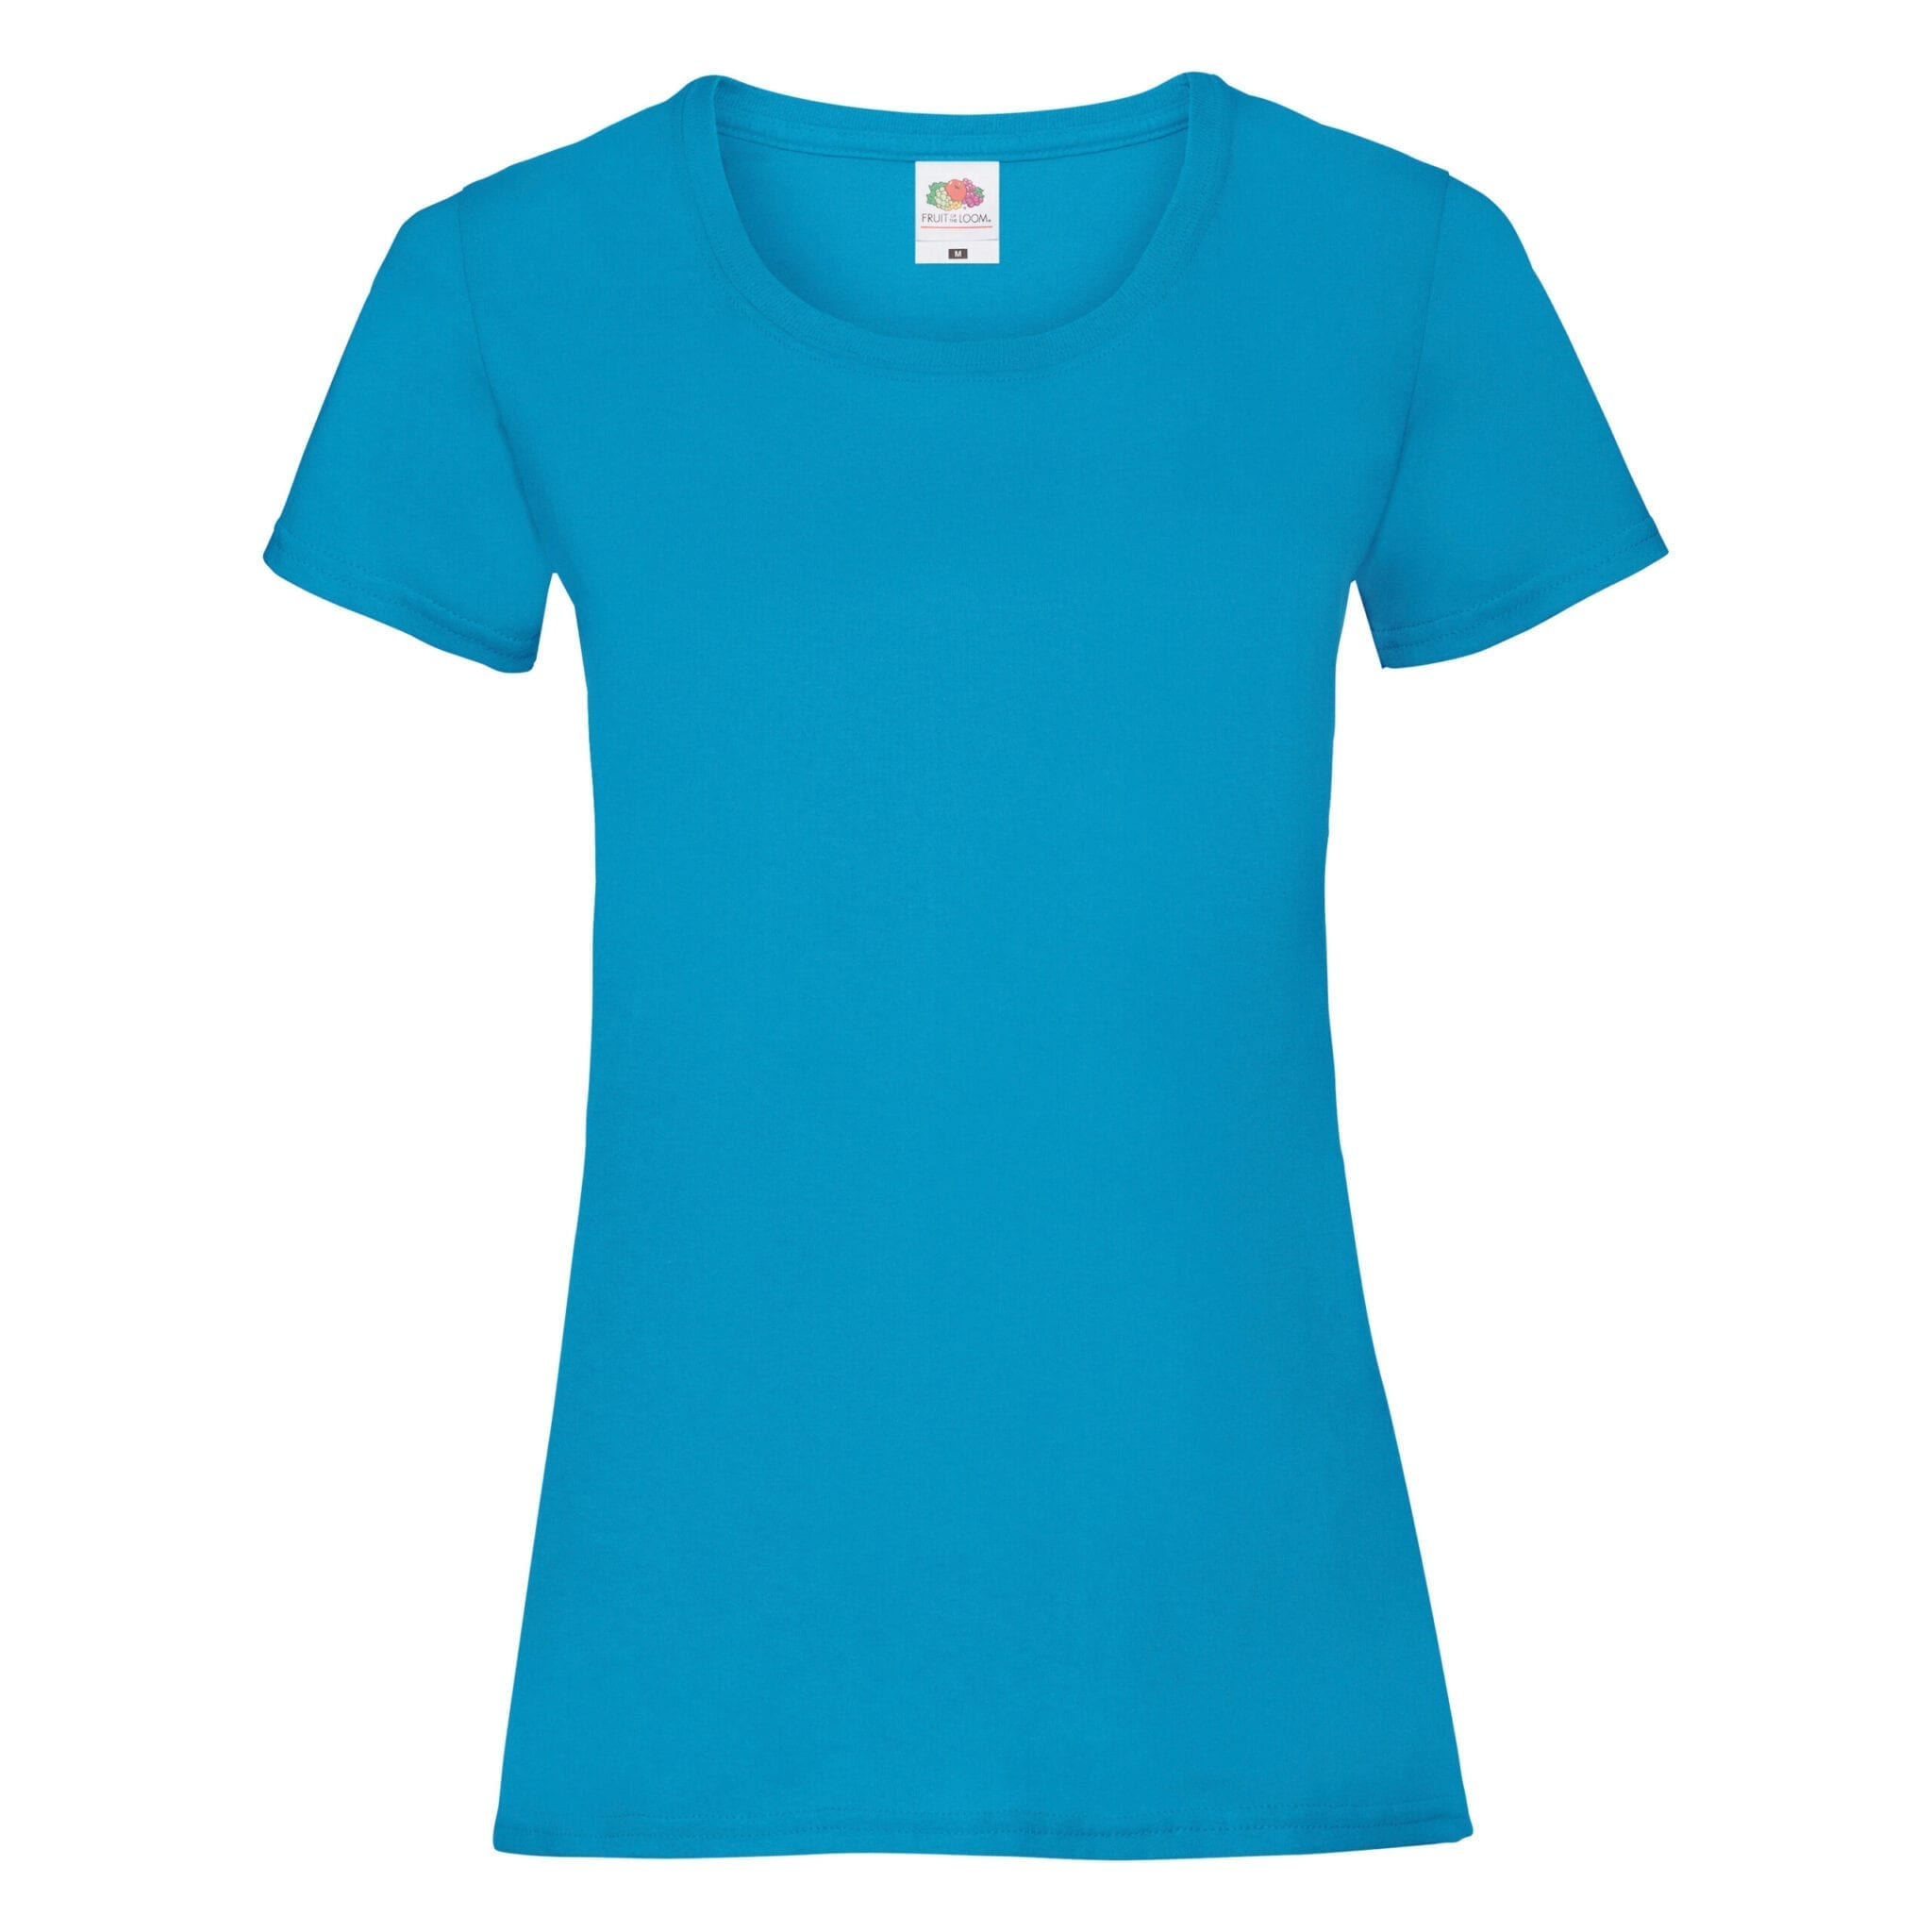 Lady-Fit Value T-shirt